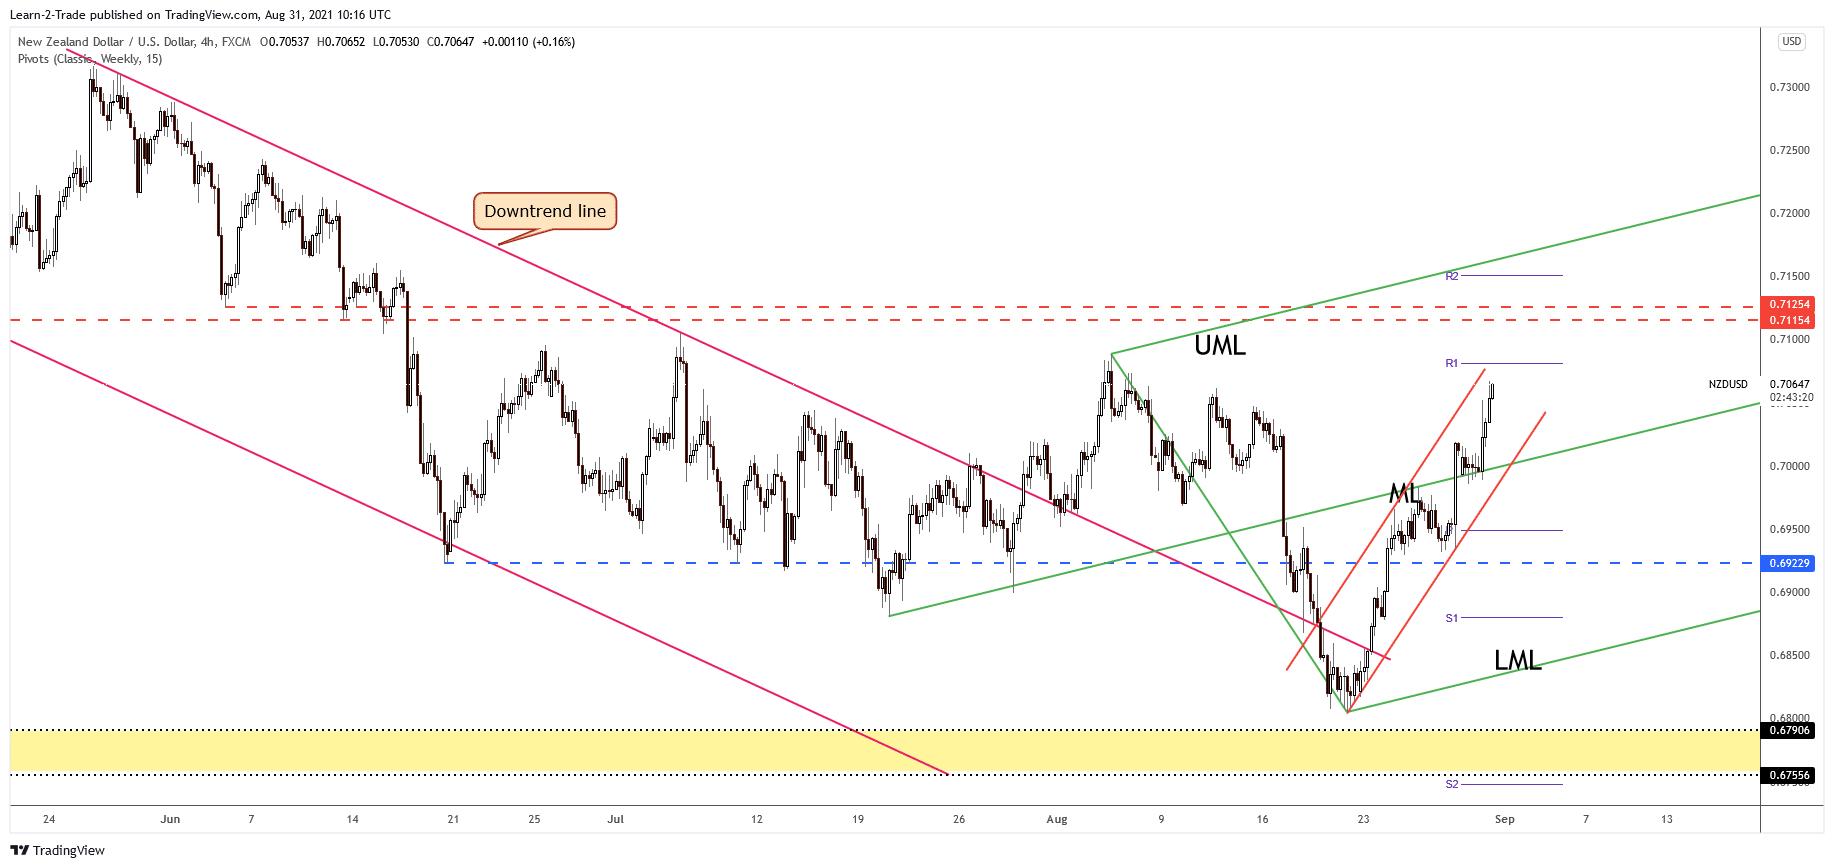 NZD/USD 4-hour price chart